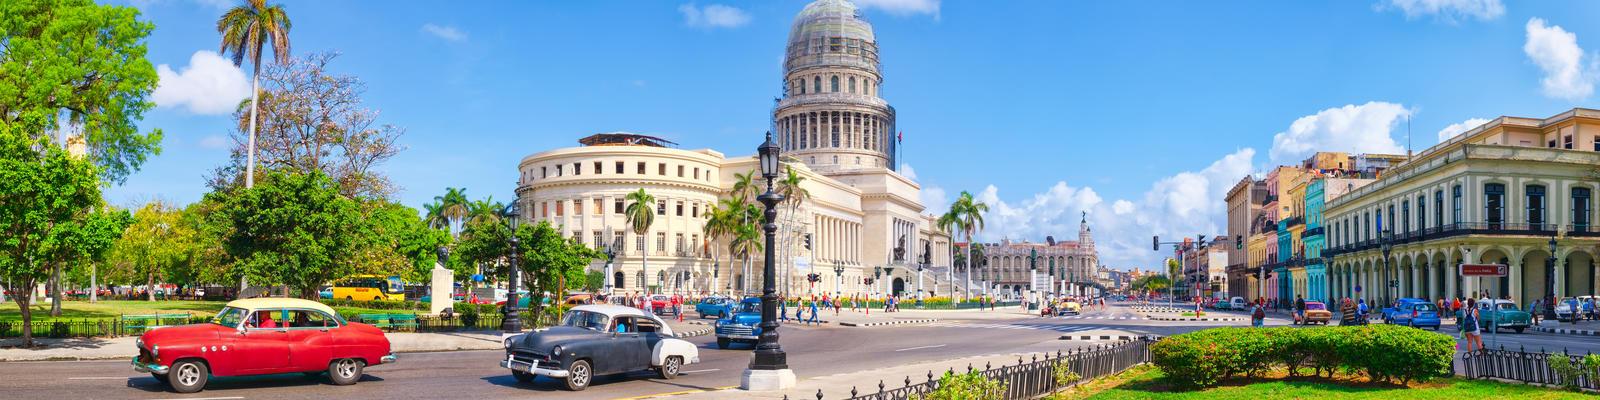 Capitol Building, Downtown Havana, Cuba (Photo: Kamira/Shutterstock)